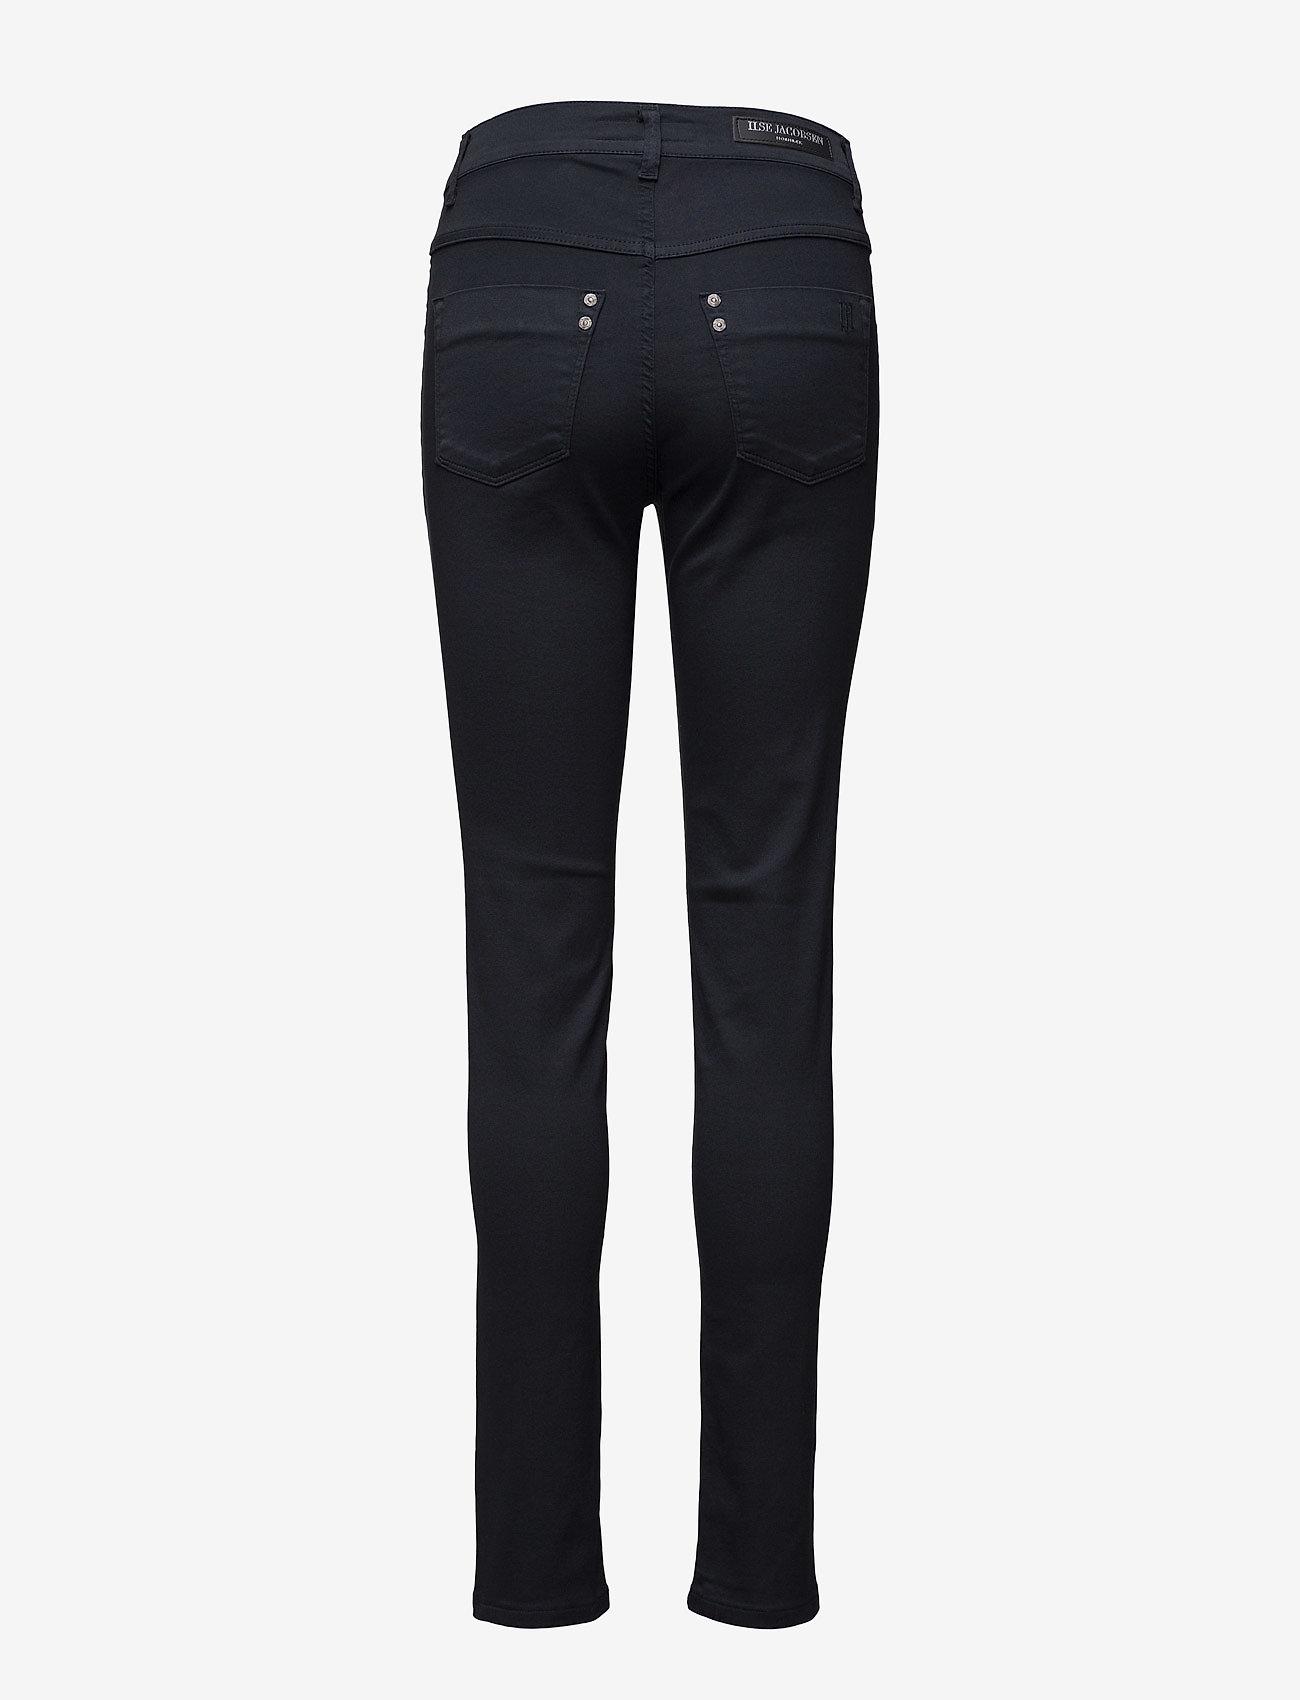 Ilse Jacobsen - TROUSERS - broeken med skinny fit - dark indigo - 1